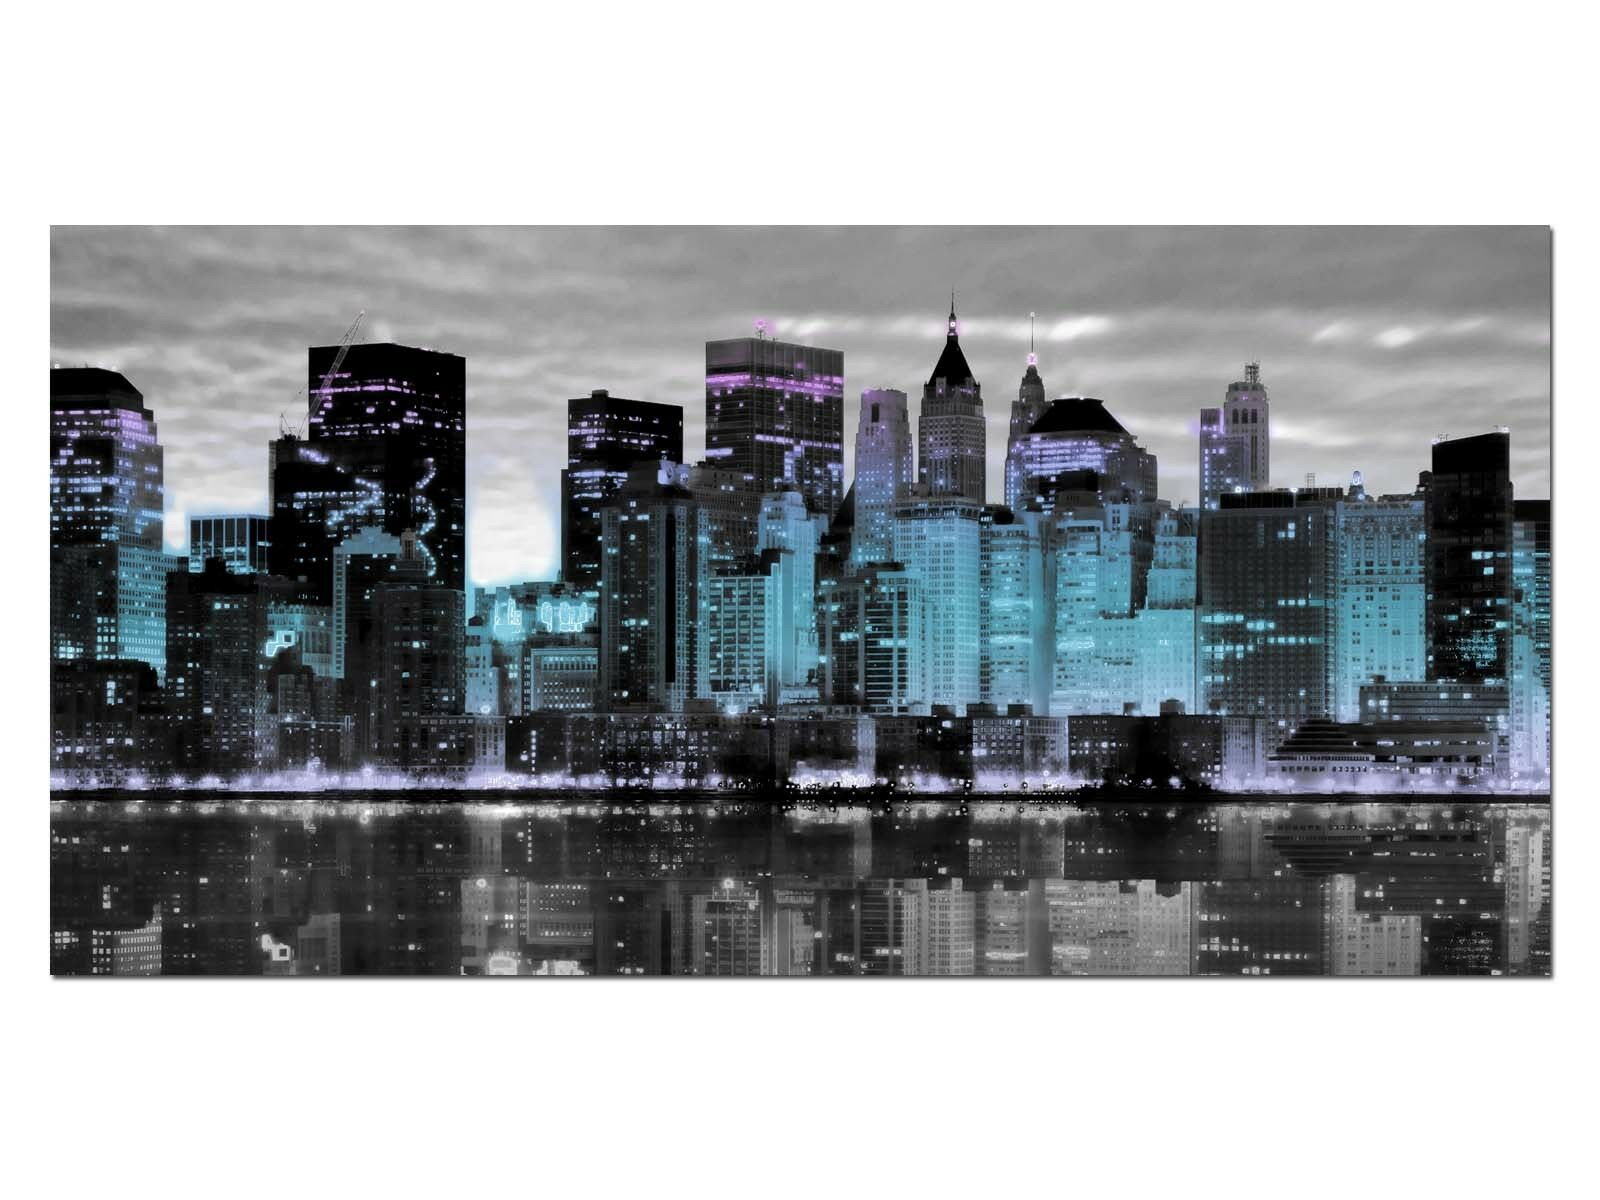 HD Glasbild EG4100500900 NEW YORK SKYLINE BLAU 100 x 50 cm Wandbild STADT